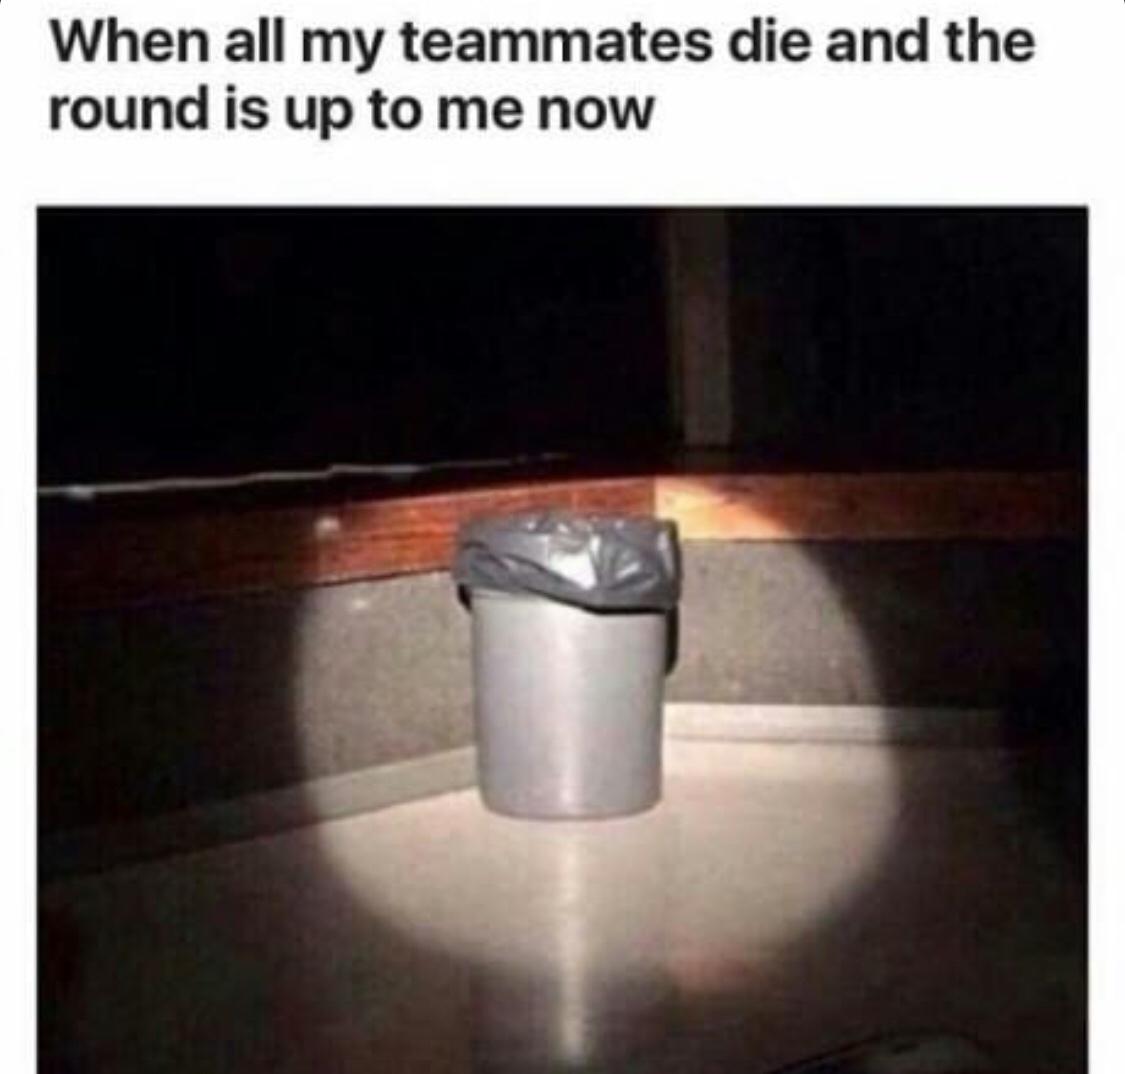 This meme hits very close to home